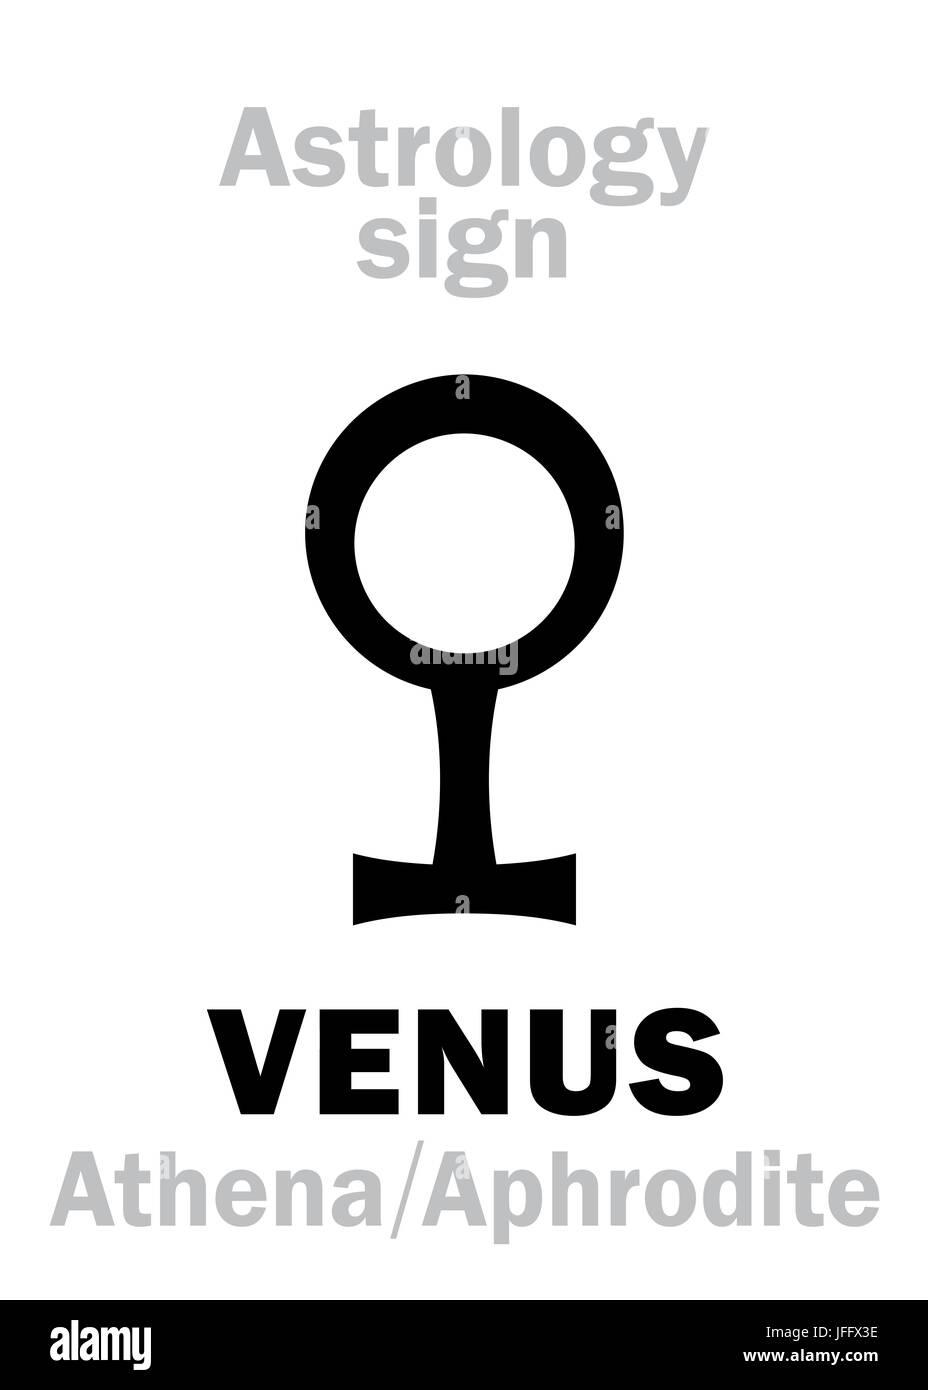 Astrology: planet VENUS - Stock Image